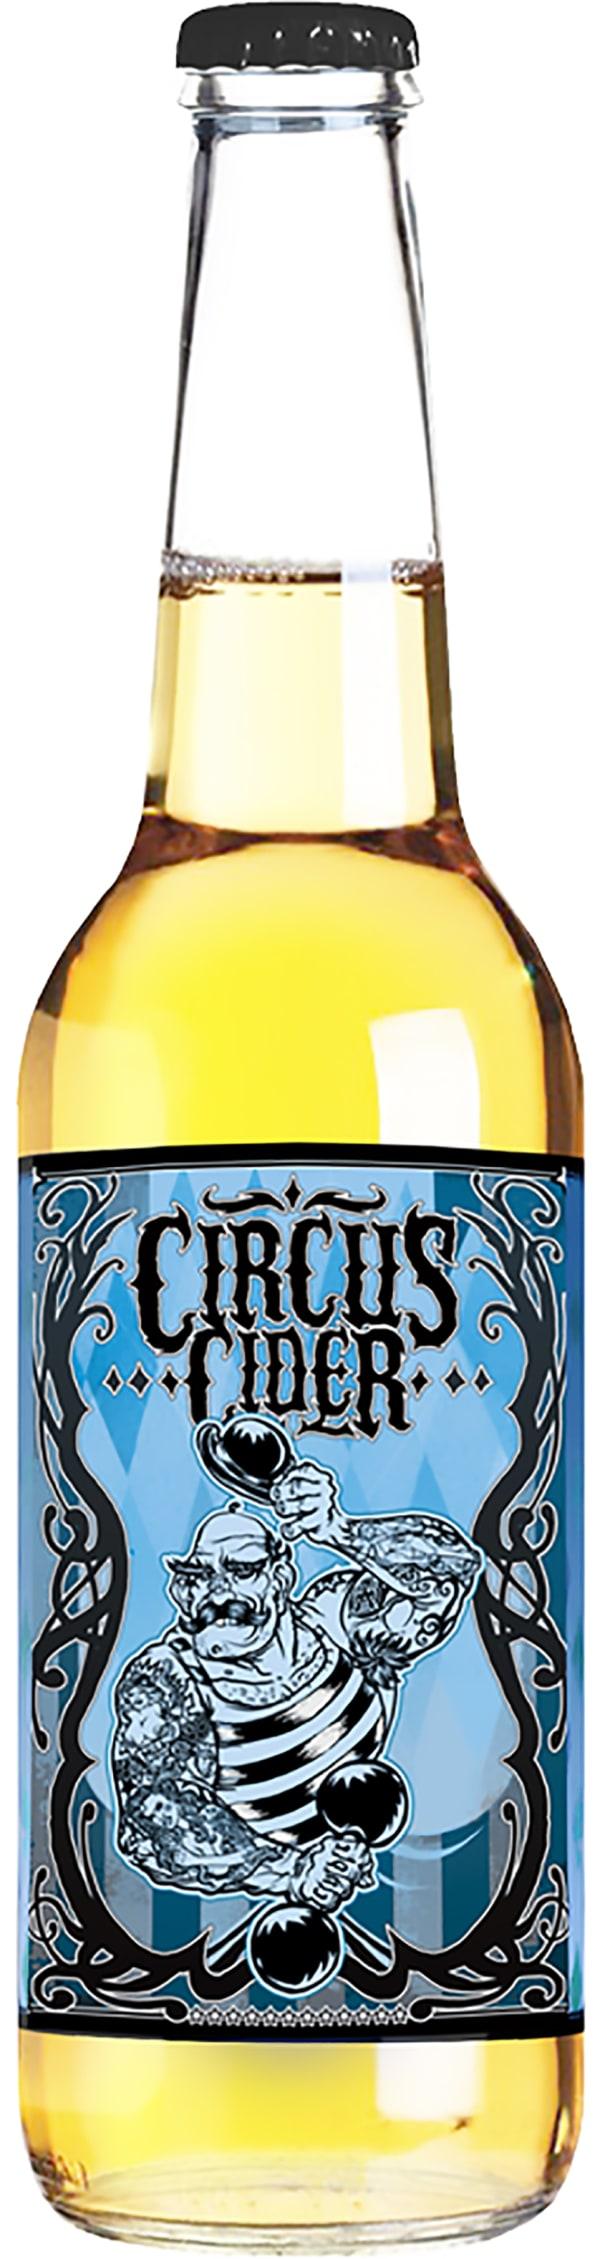 Strongman Circus Cider 2016